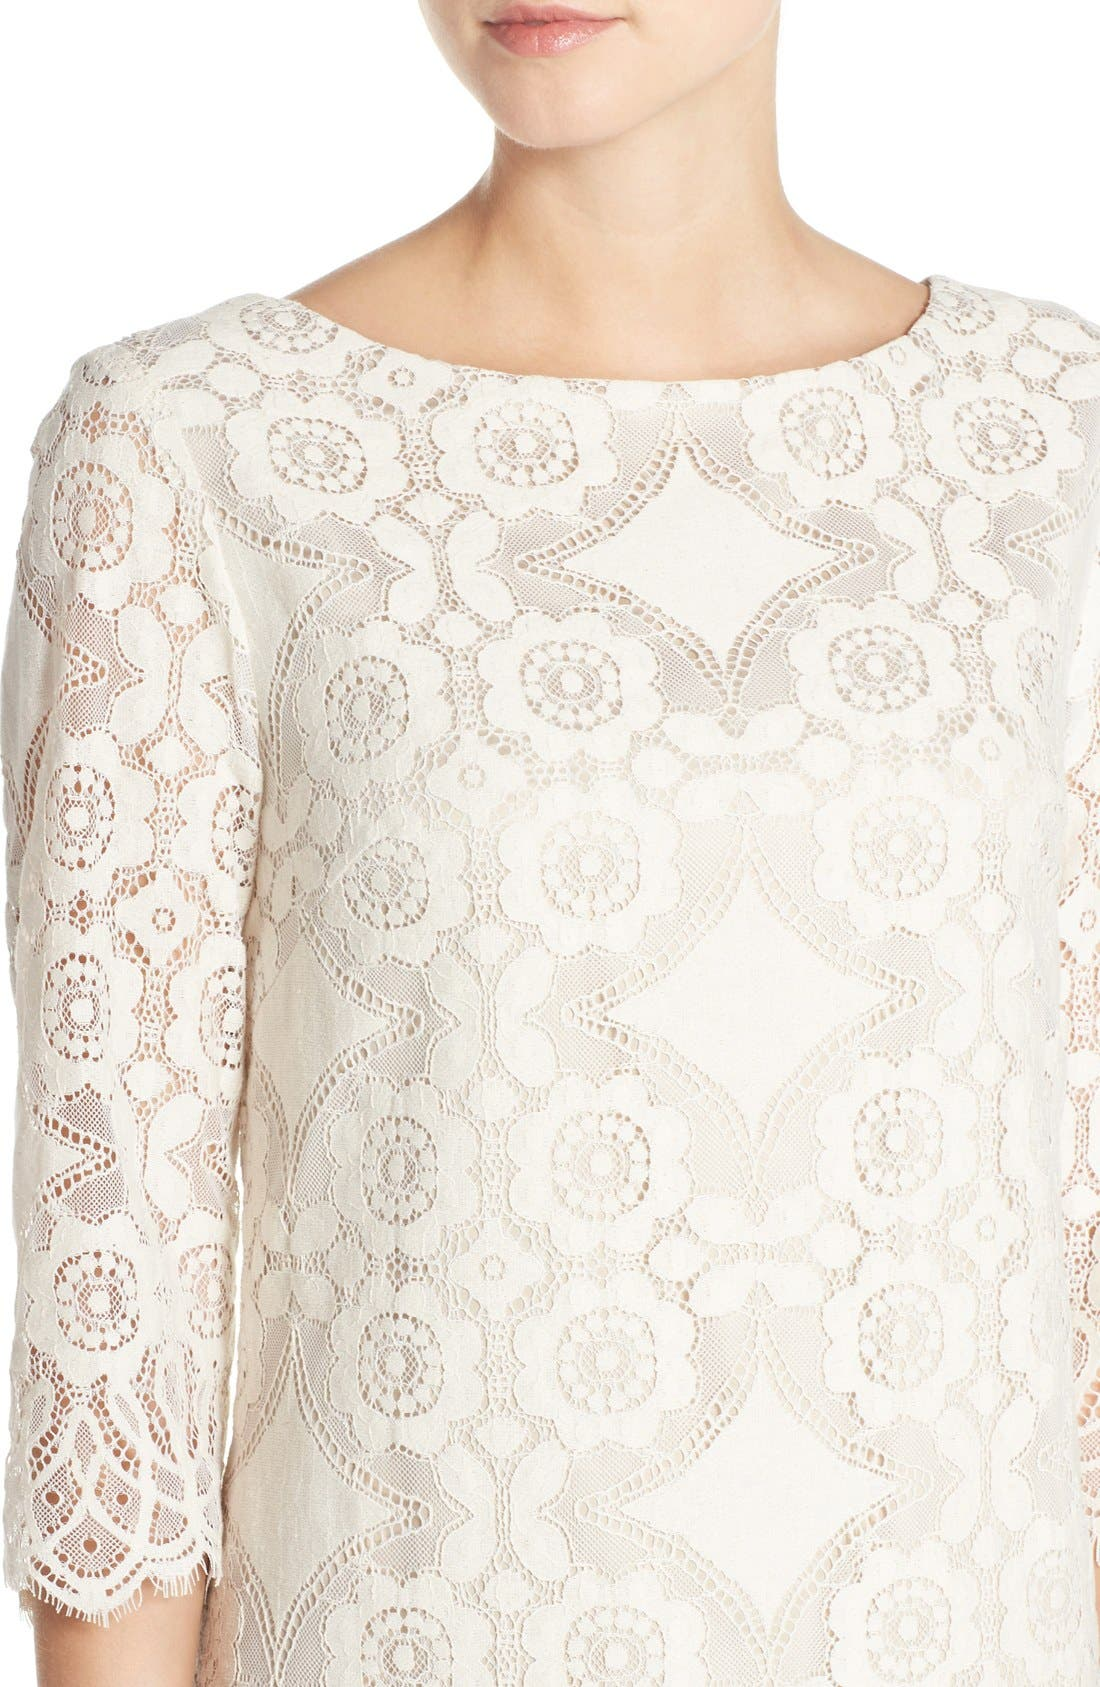 Lace Shift Dress,                             Alternate thumbnail 4, color,                             Ivory